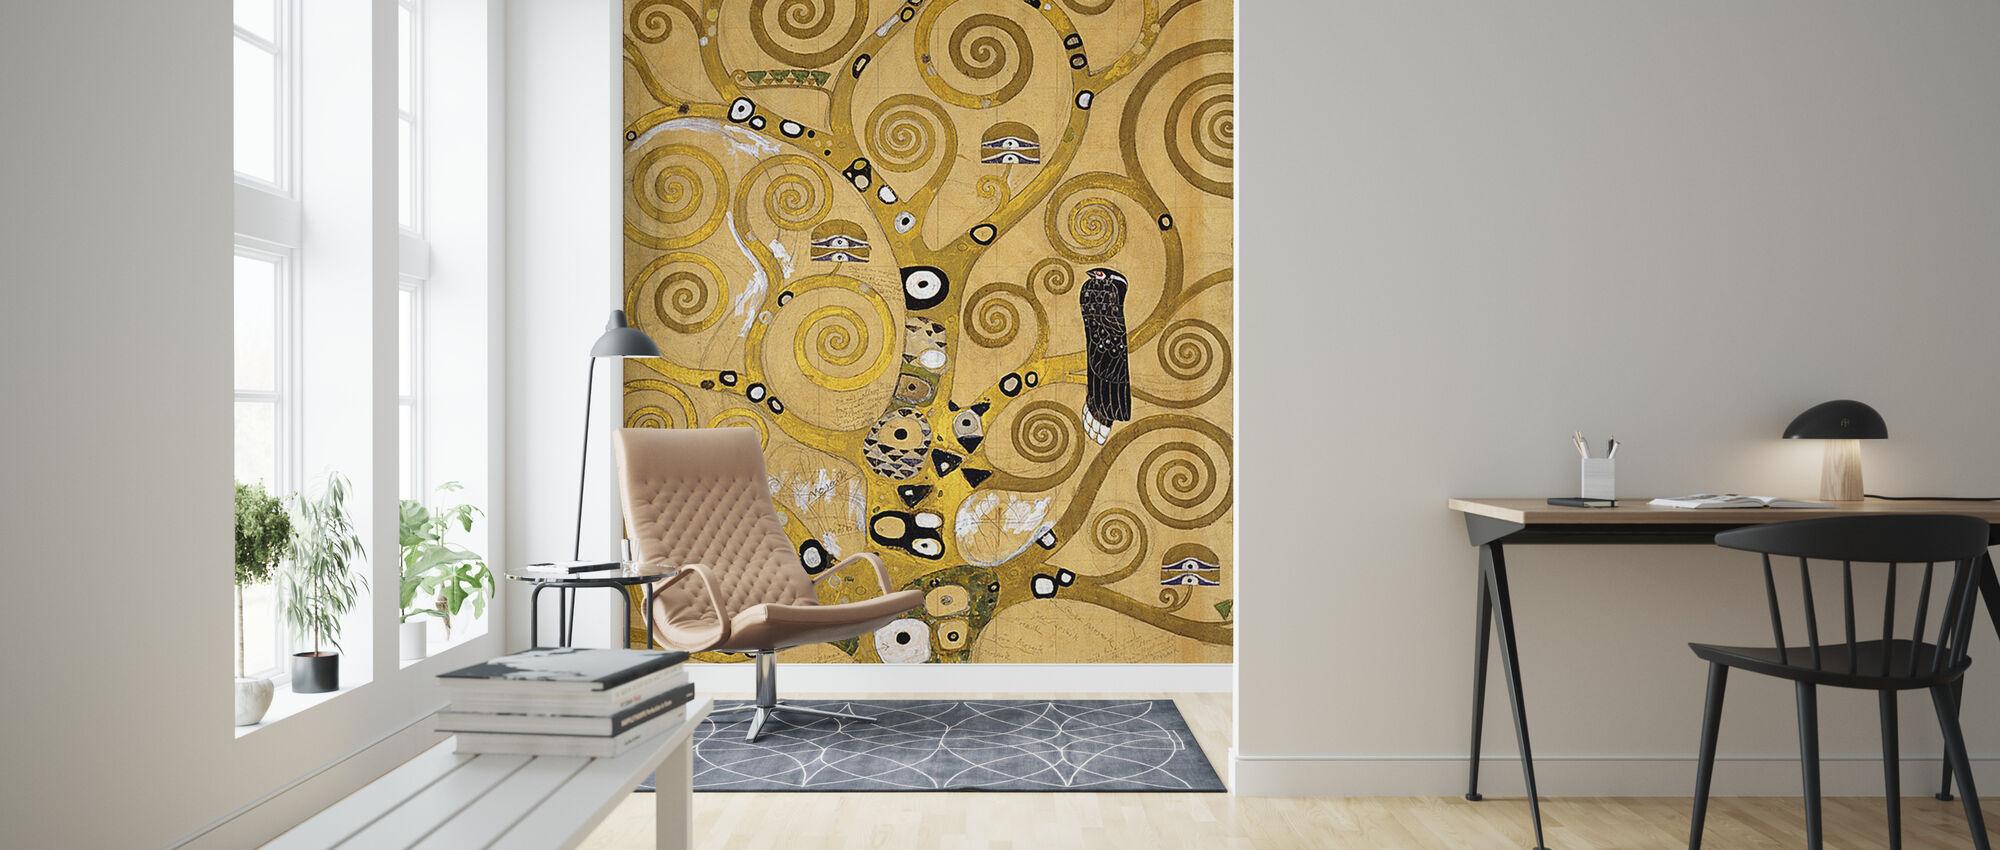 Klimt Gustav The Tree Of Life Affordable Wall Mural Photowall